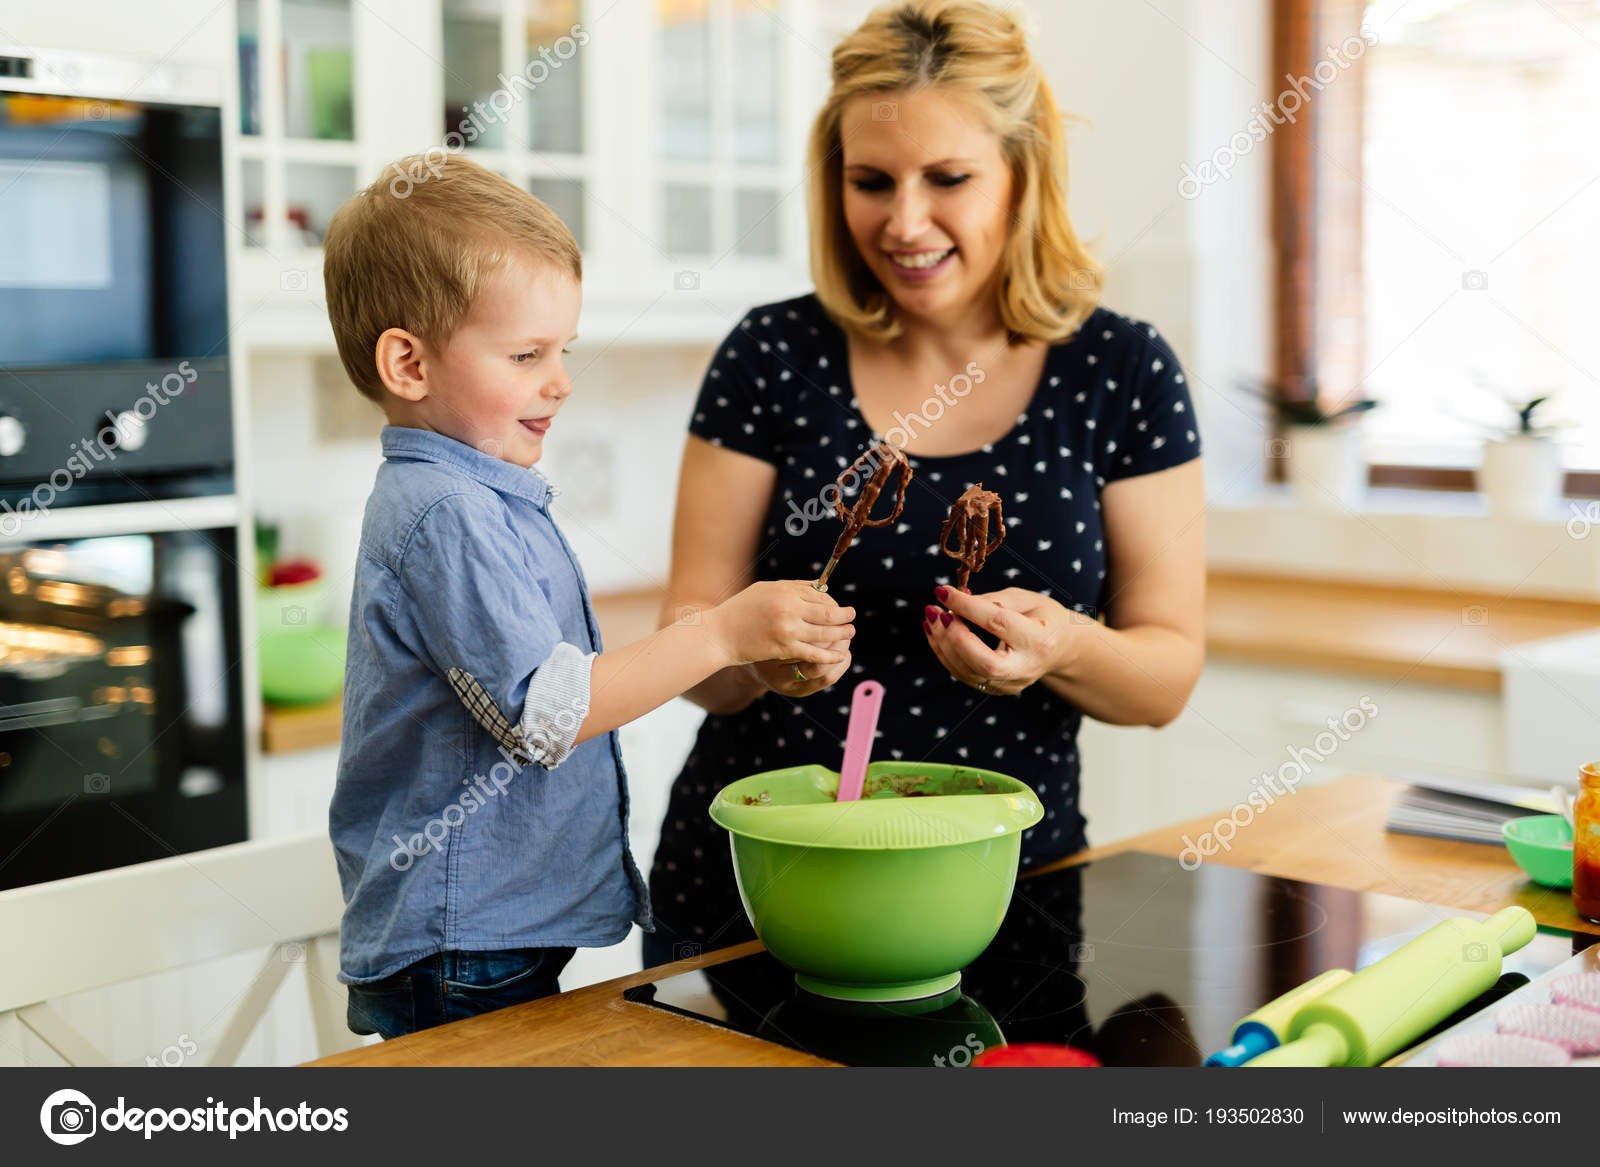 macys kitchen aid modern window treatments 帮助准备松饼在厨房的妈妈的孩子 图库照片 c nd3000 193502830